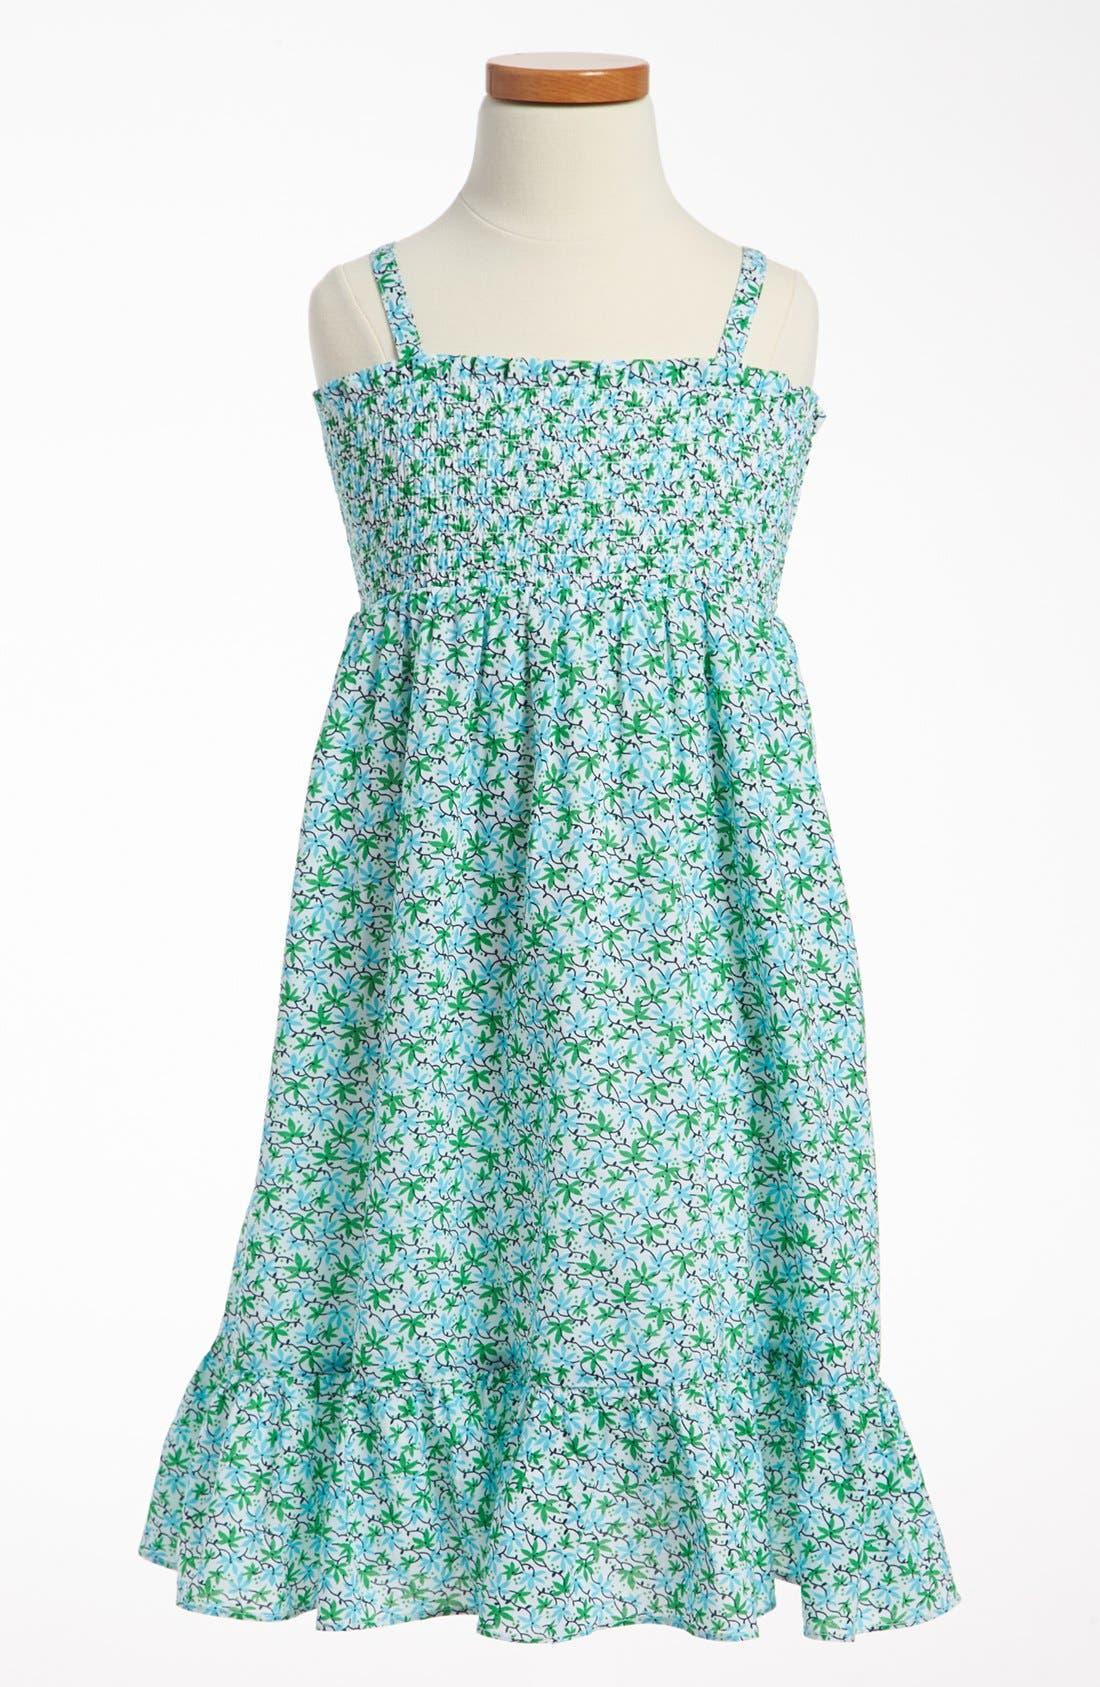 Main Image - Tucker + Tate 'Laurel' Dress (Big Girls)